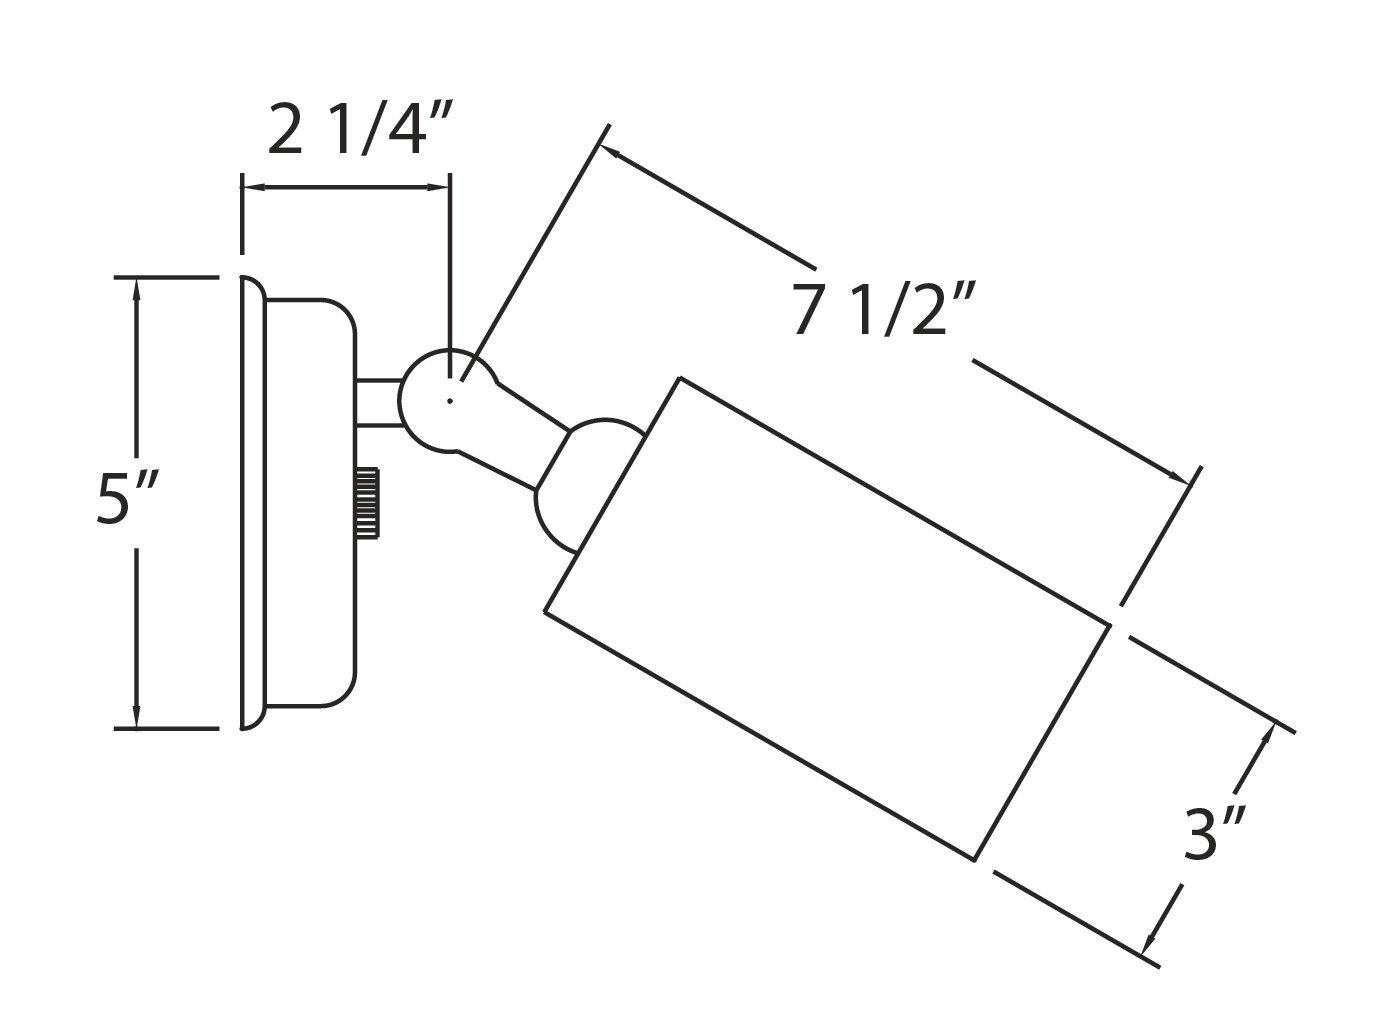 NICOR Lighting 50-Watt Double Bullet Adjustable Outdoor Flood Light, Bronze (11528) by NICOR Lighting (Image #2)